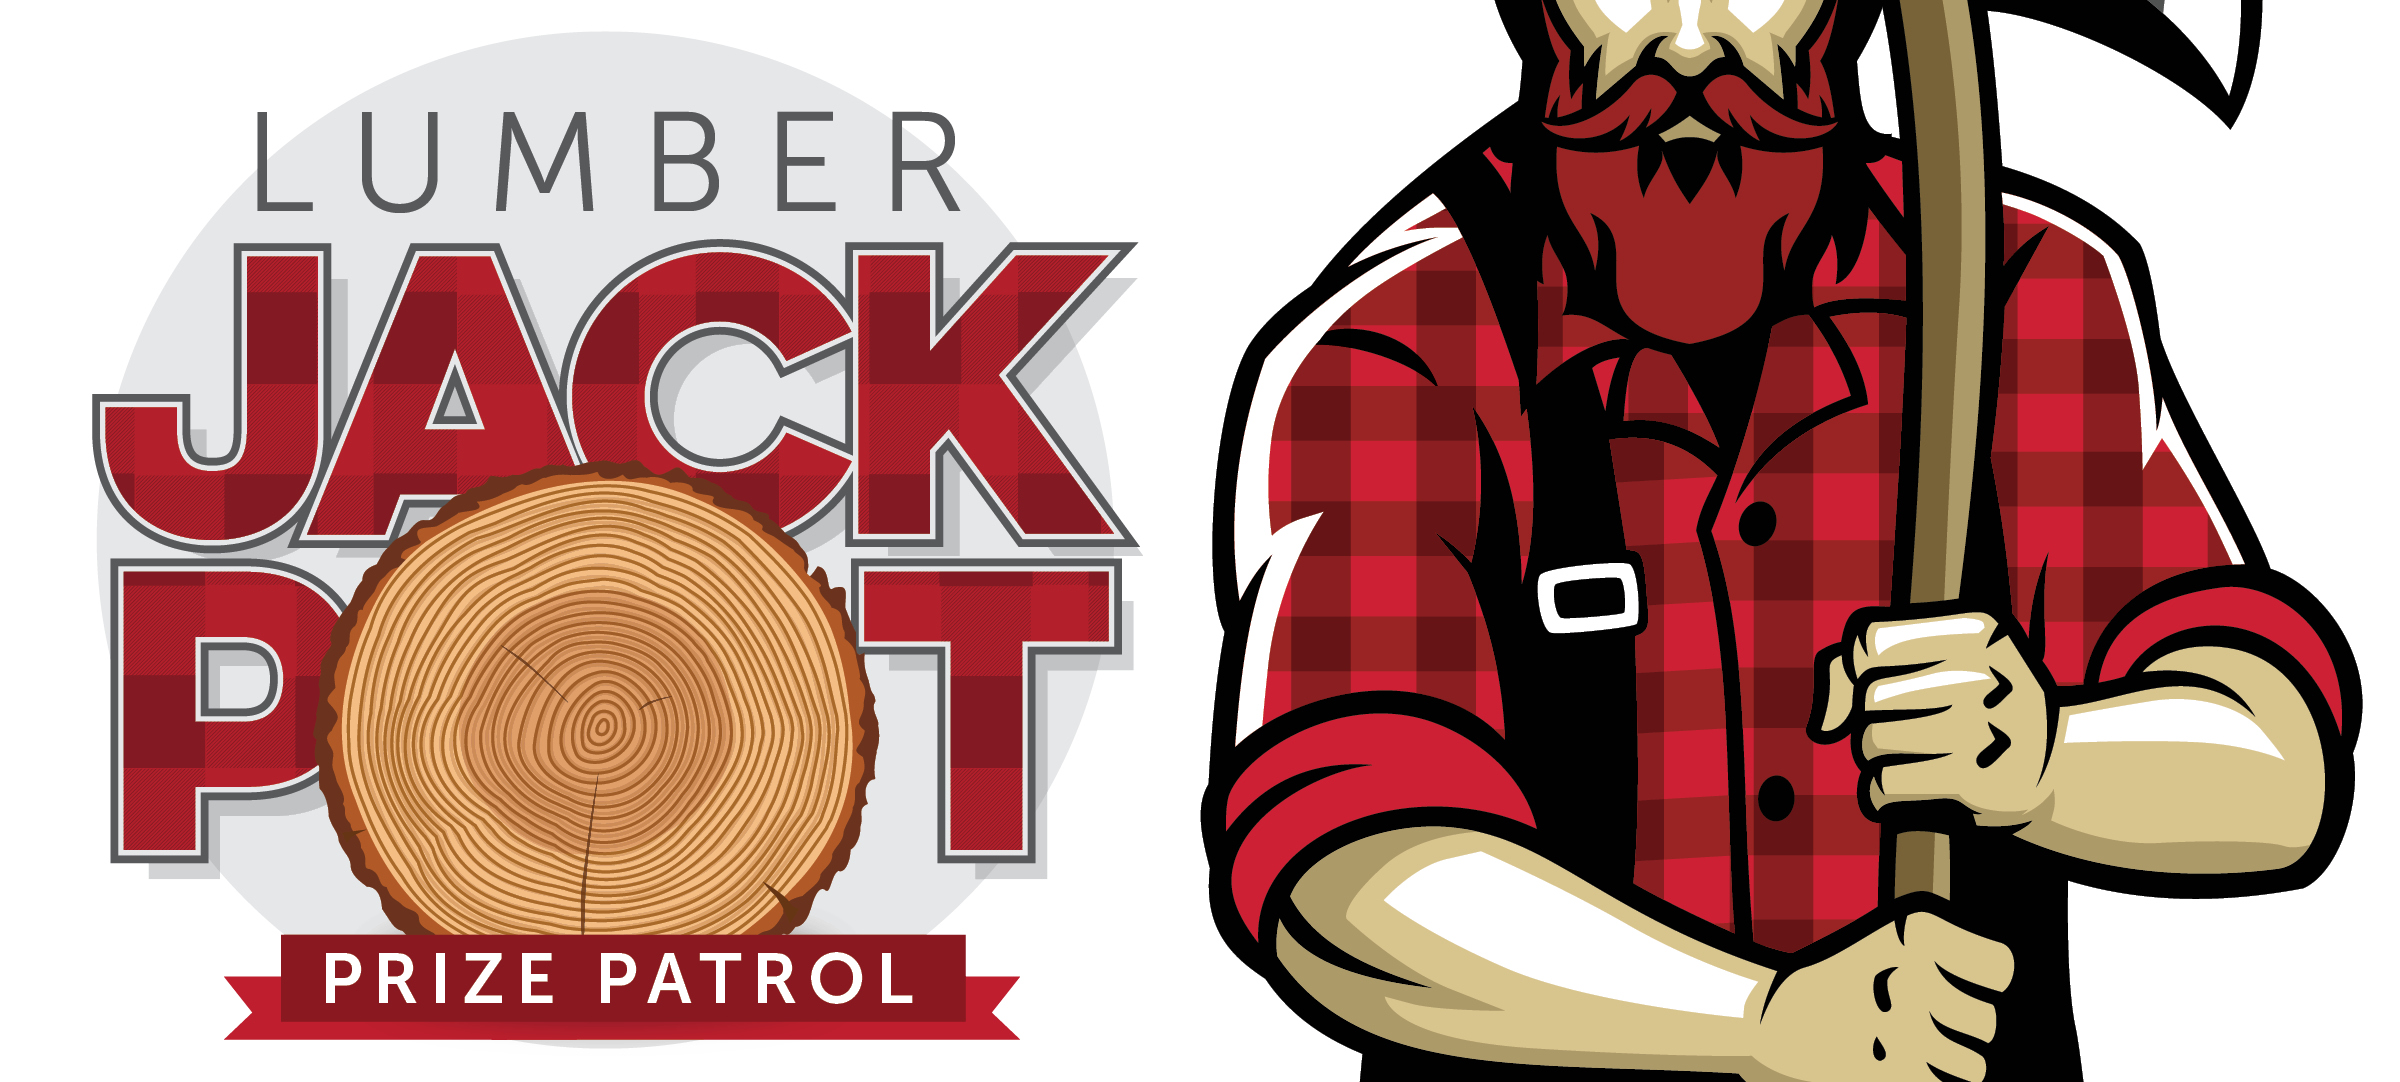 Lumber Jackpot Prize Patrol